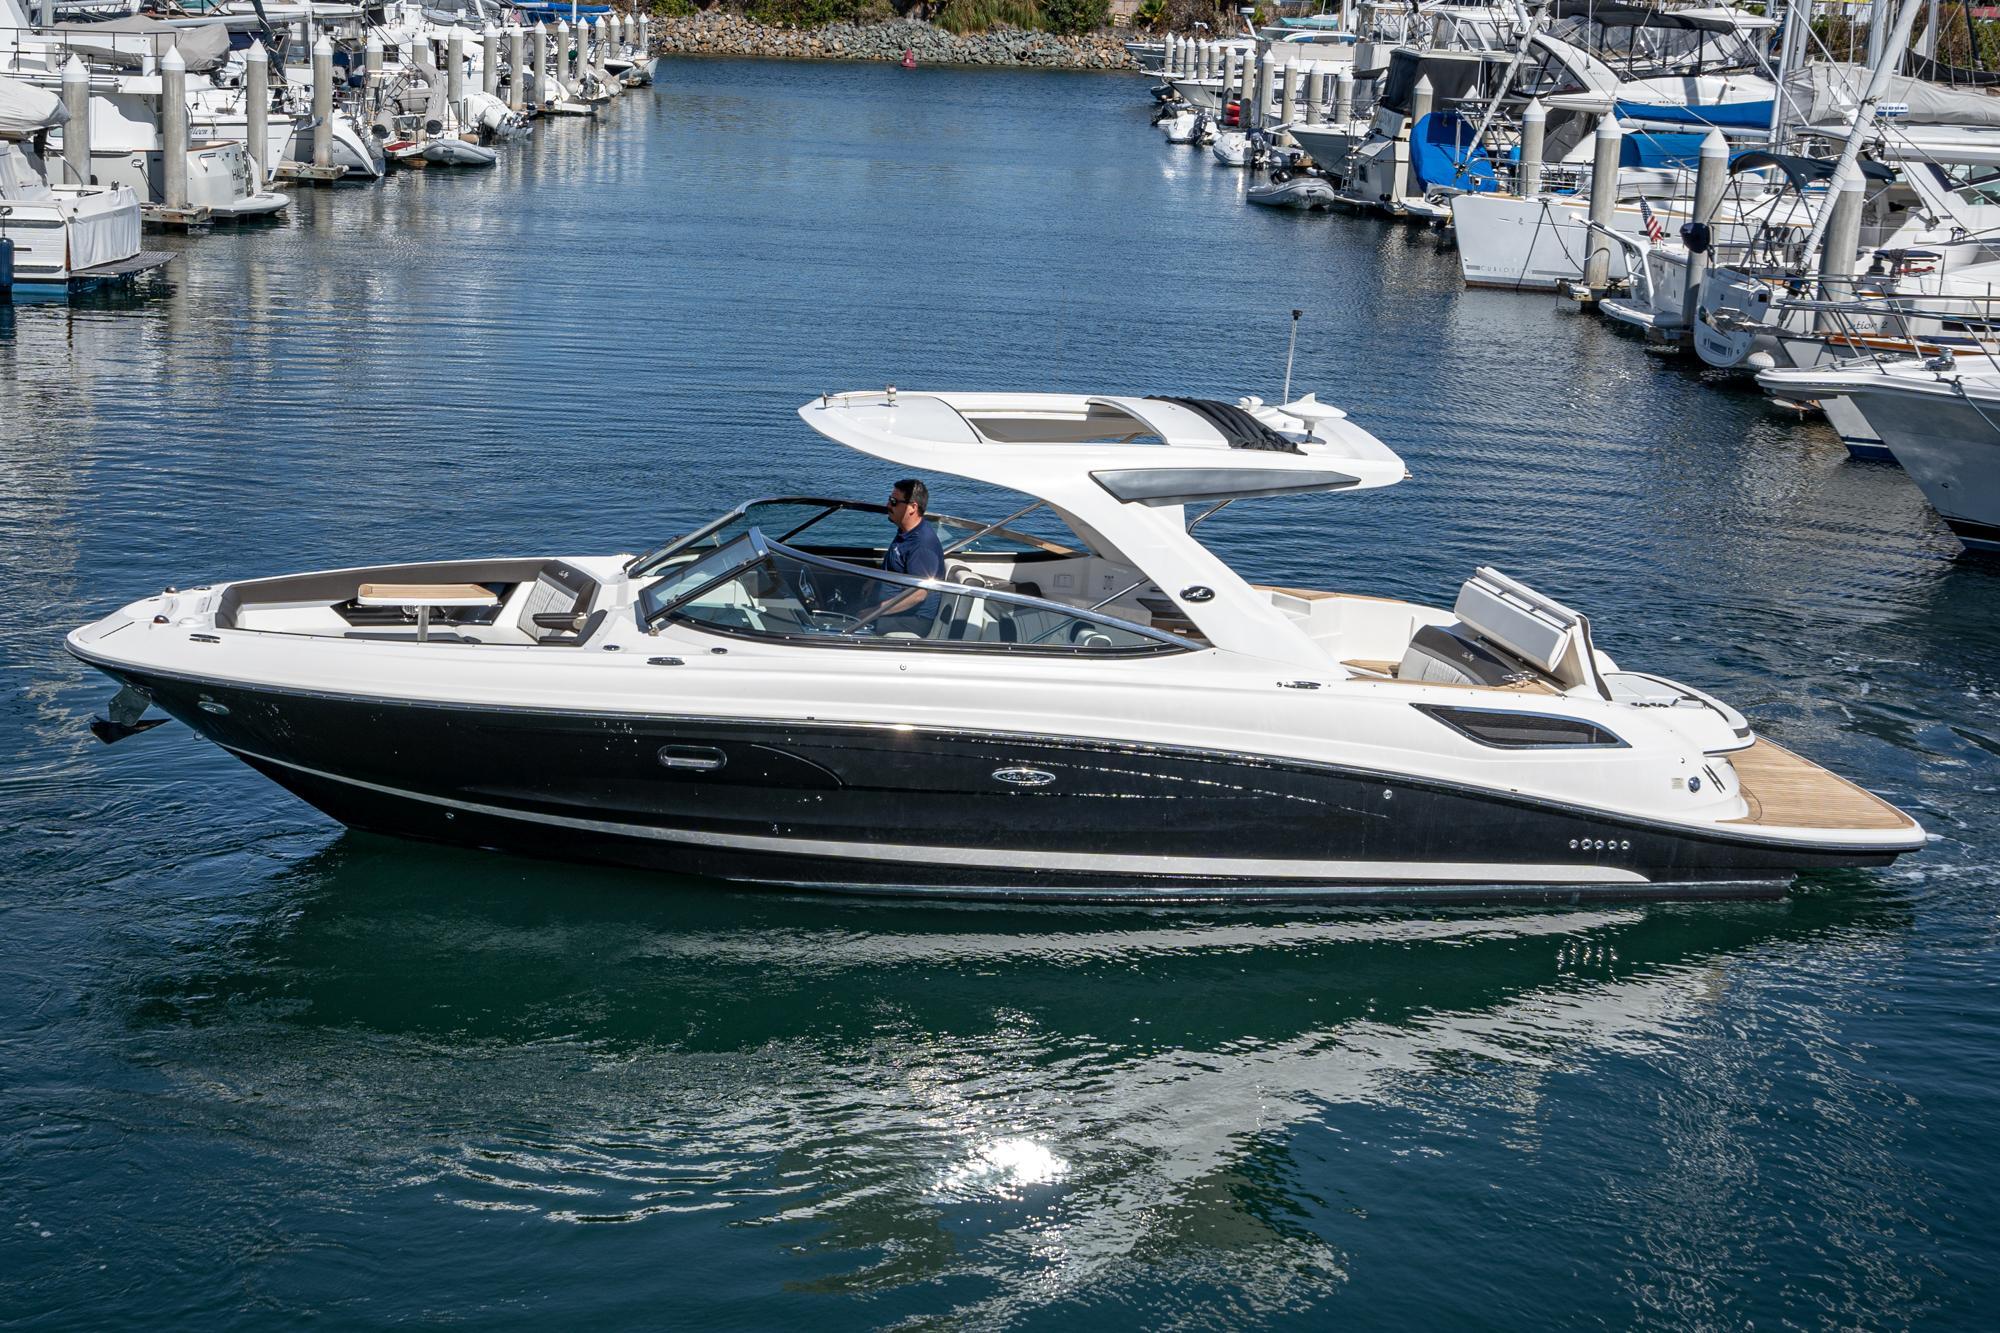 2018 Sea Ray 350 SLX #TB1418RM inventory image at Sun Country Coastal in San Diego